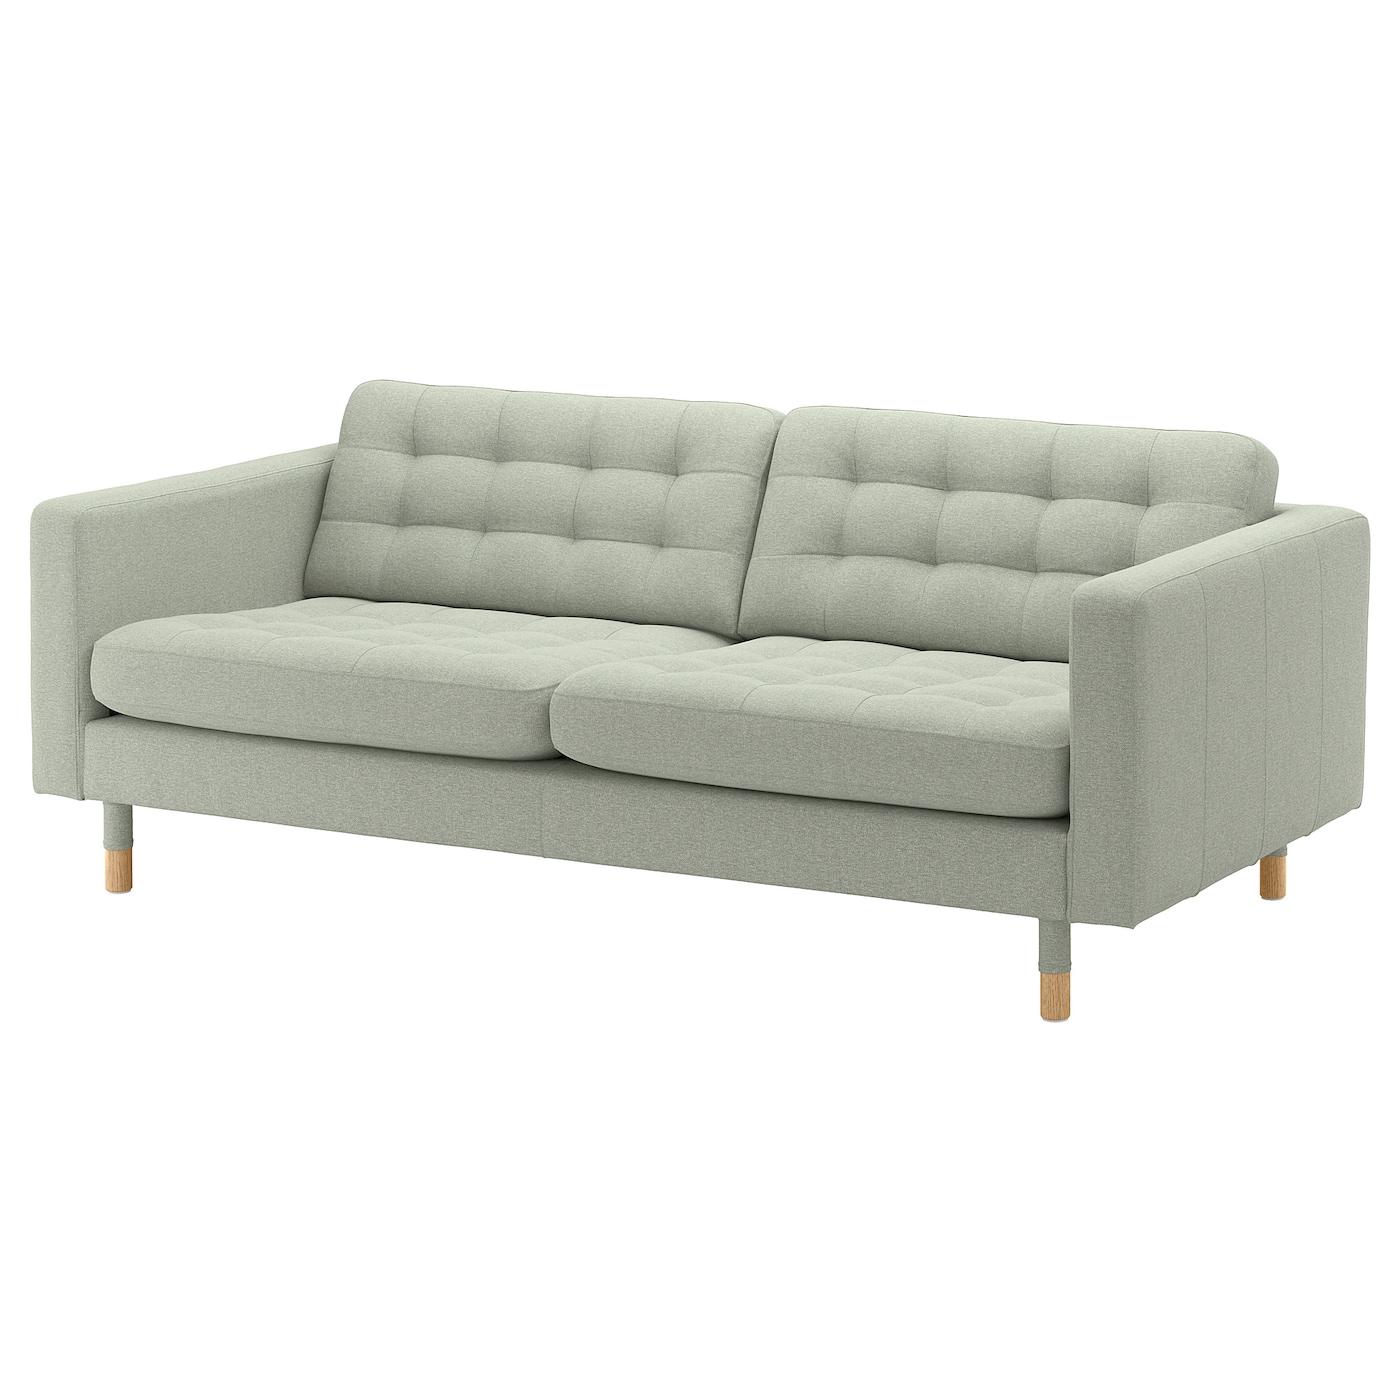 Kleiderbügel Holz Ikea : landskrona 3er sofa gunnared hellgr n holz ikea ~ Watch28wear.com Haus und Dekorationen